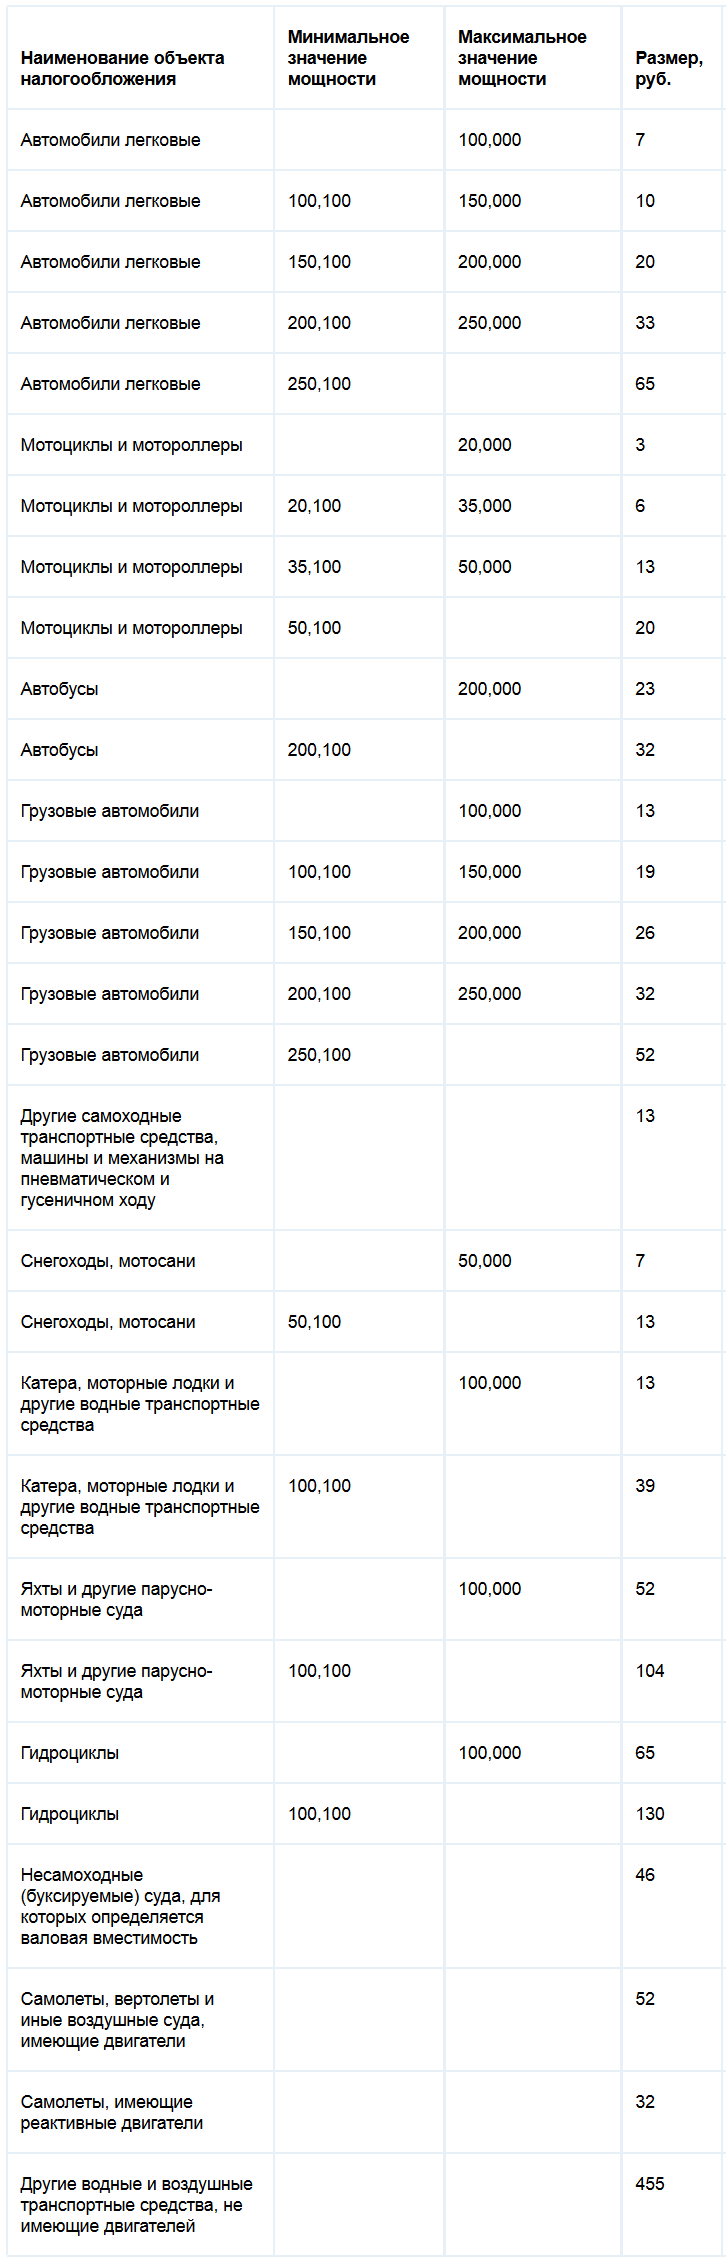 Ставки транспортного налога Забайкальского края